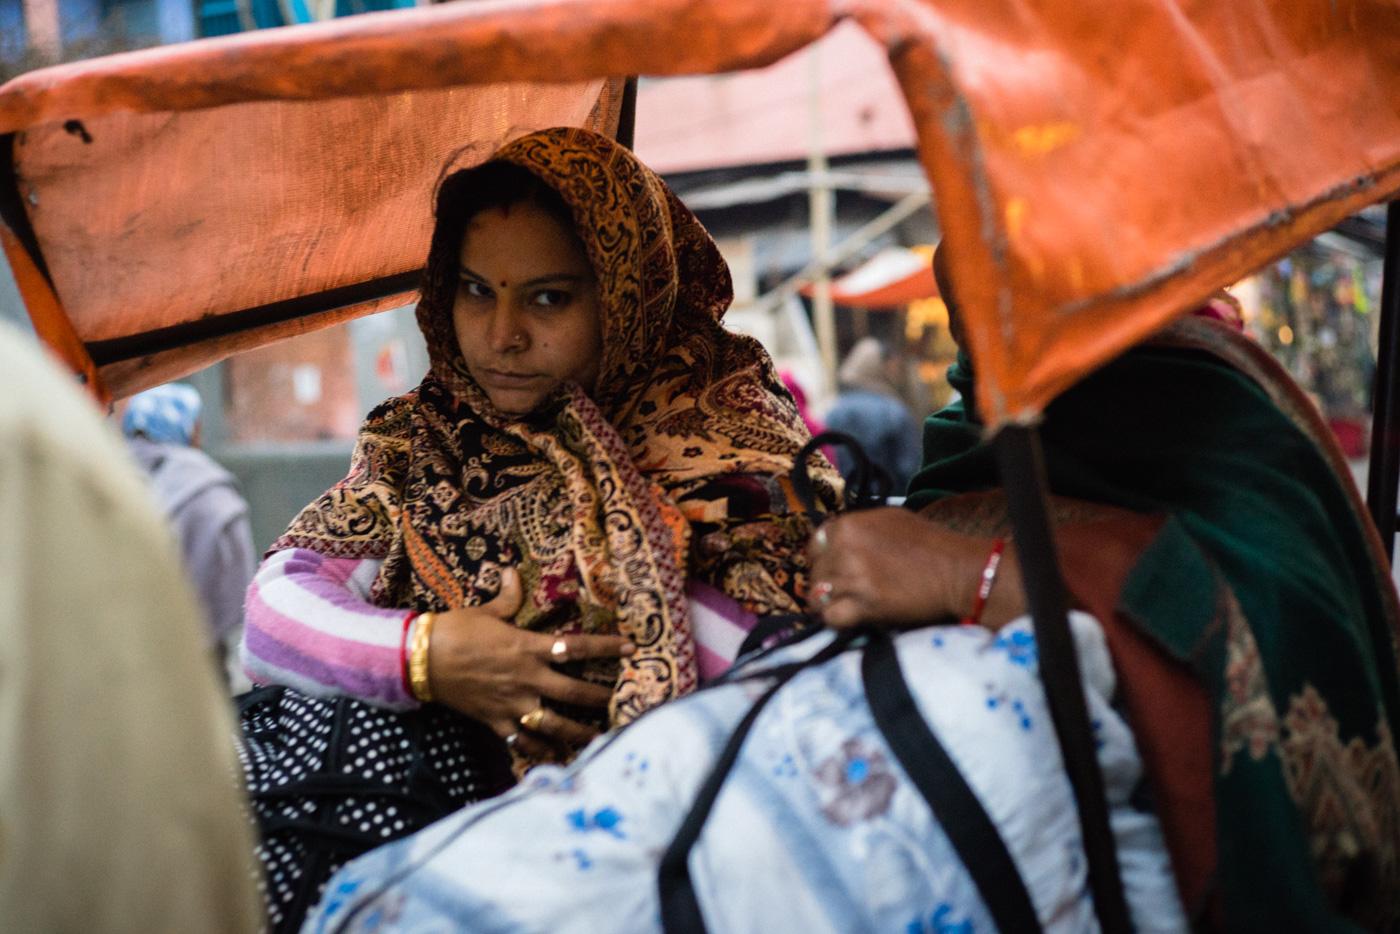 Haridwar, India - Leica 50mm Summicron f/2